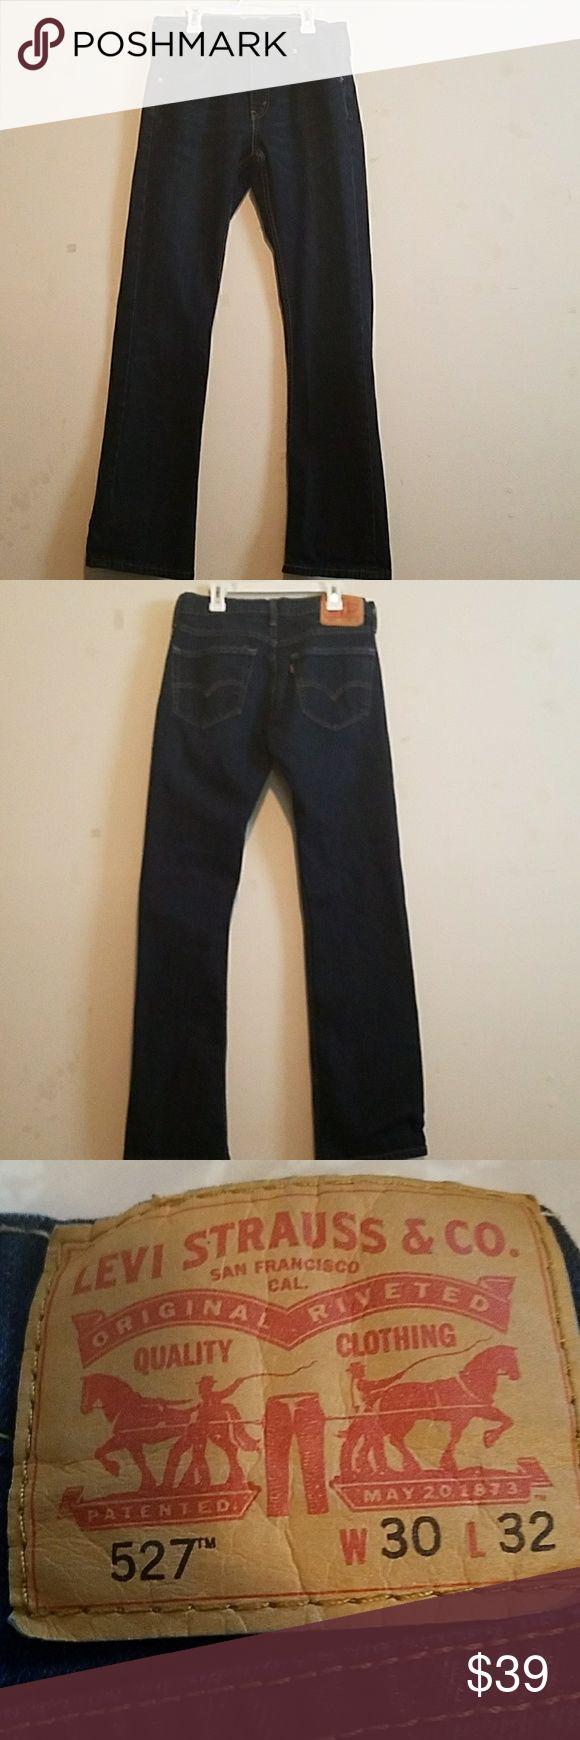 Levi's Men's 527 Slim Bootcut Jean 30Wx32L Dark wash, 5 pocket, worn 3 times Levi's Jeans Bootcut